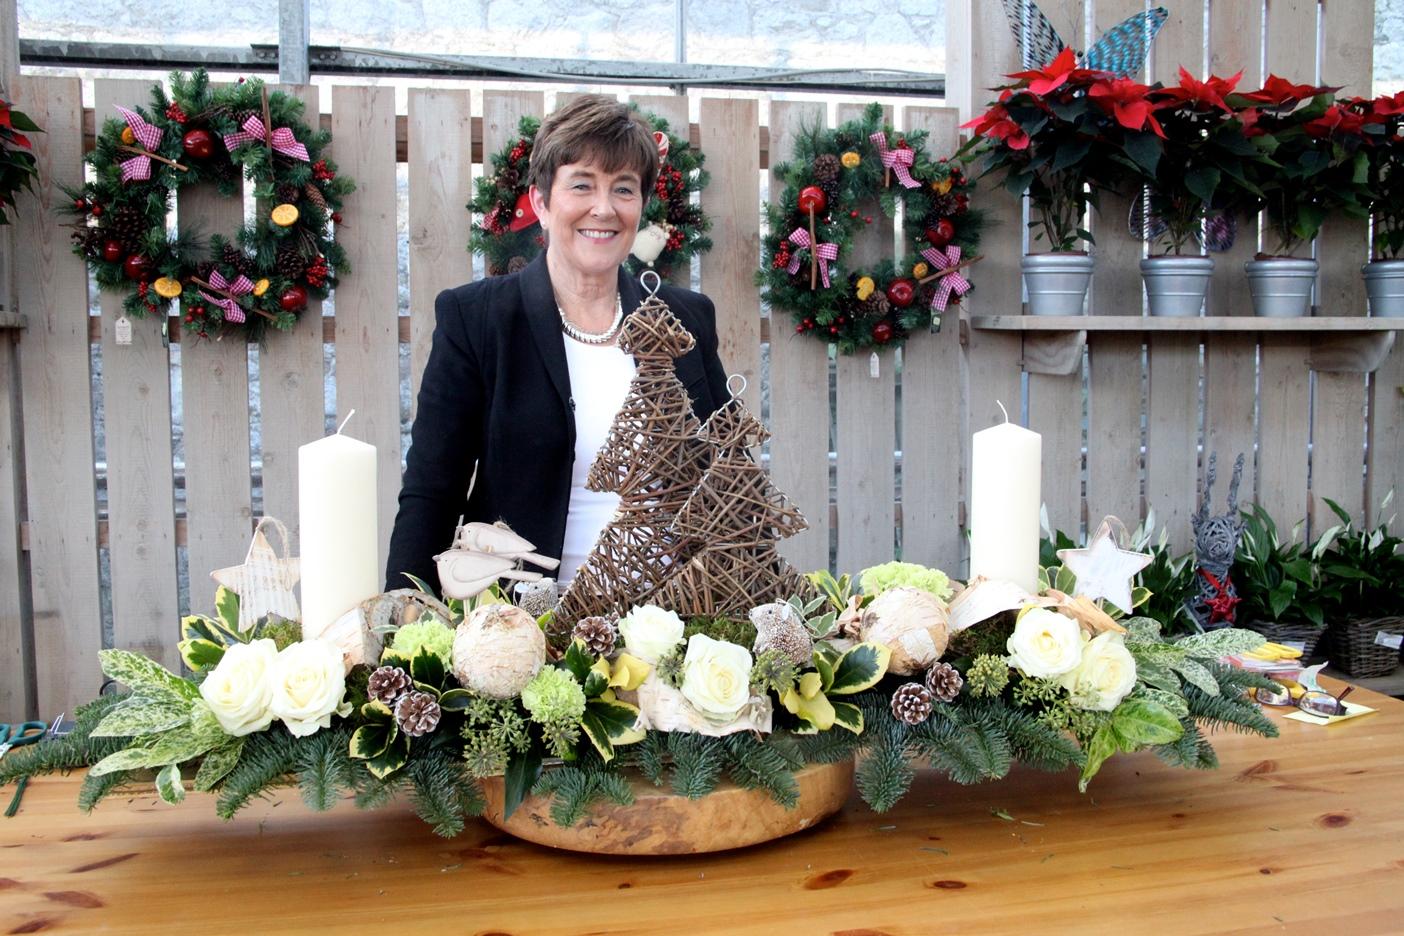 DIY Christmas Floral Art With Carol Bone At Powerscourt